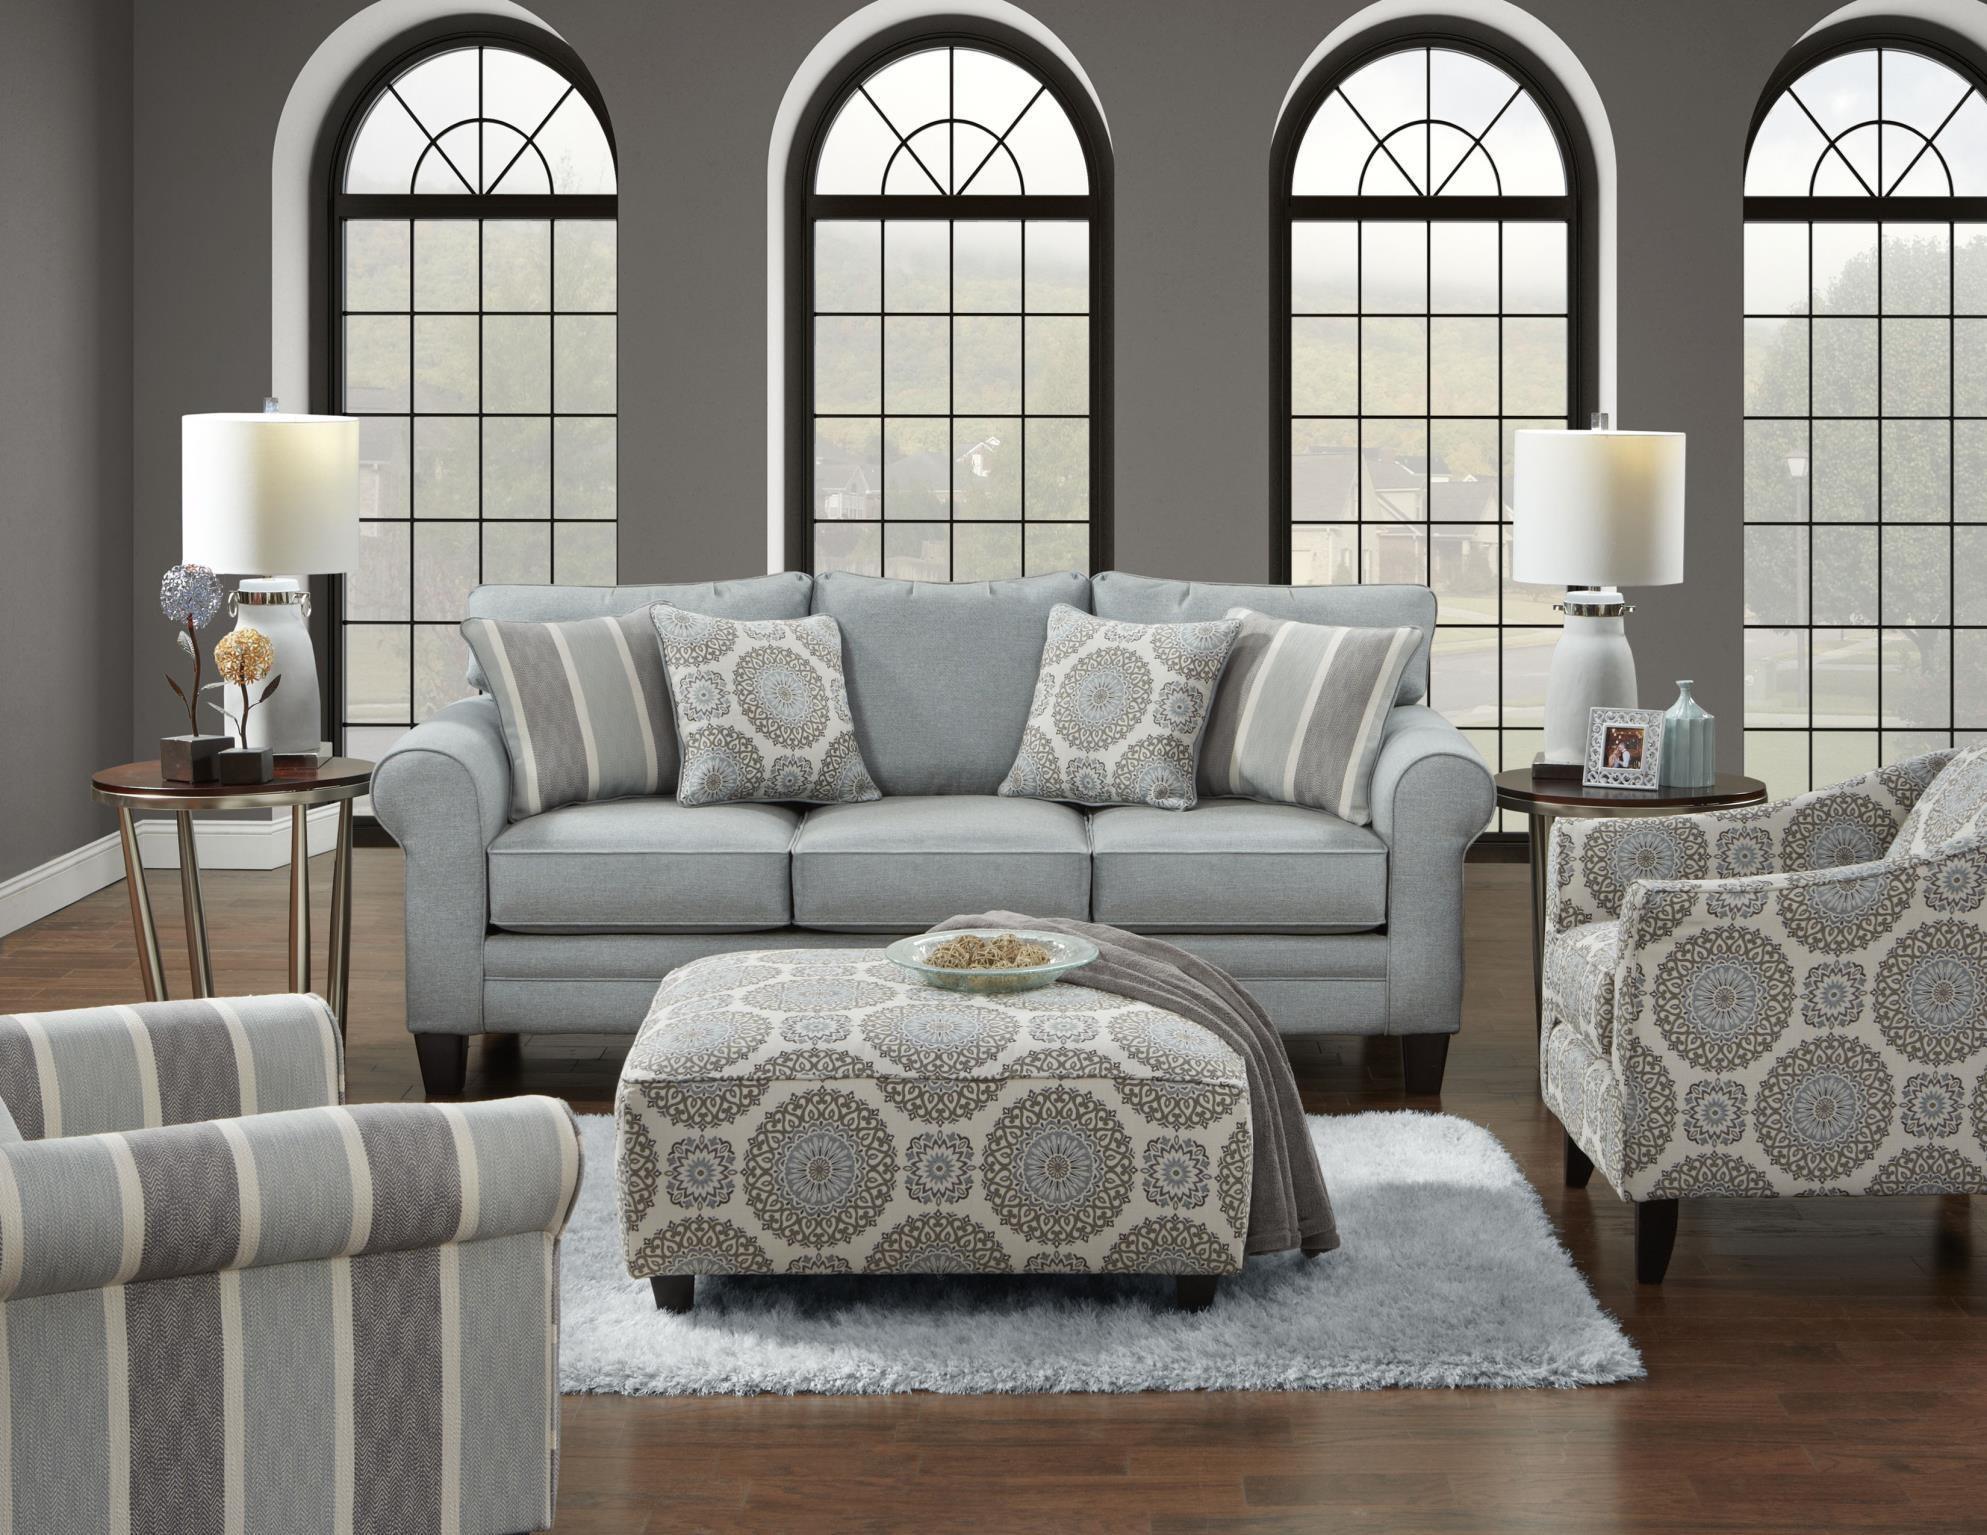 1140 Grande Mist Grande Mist Living Room by Fusion Furniture at Furniture Fair - North Carolina